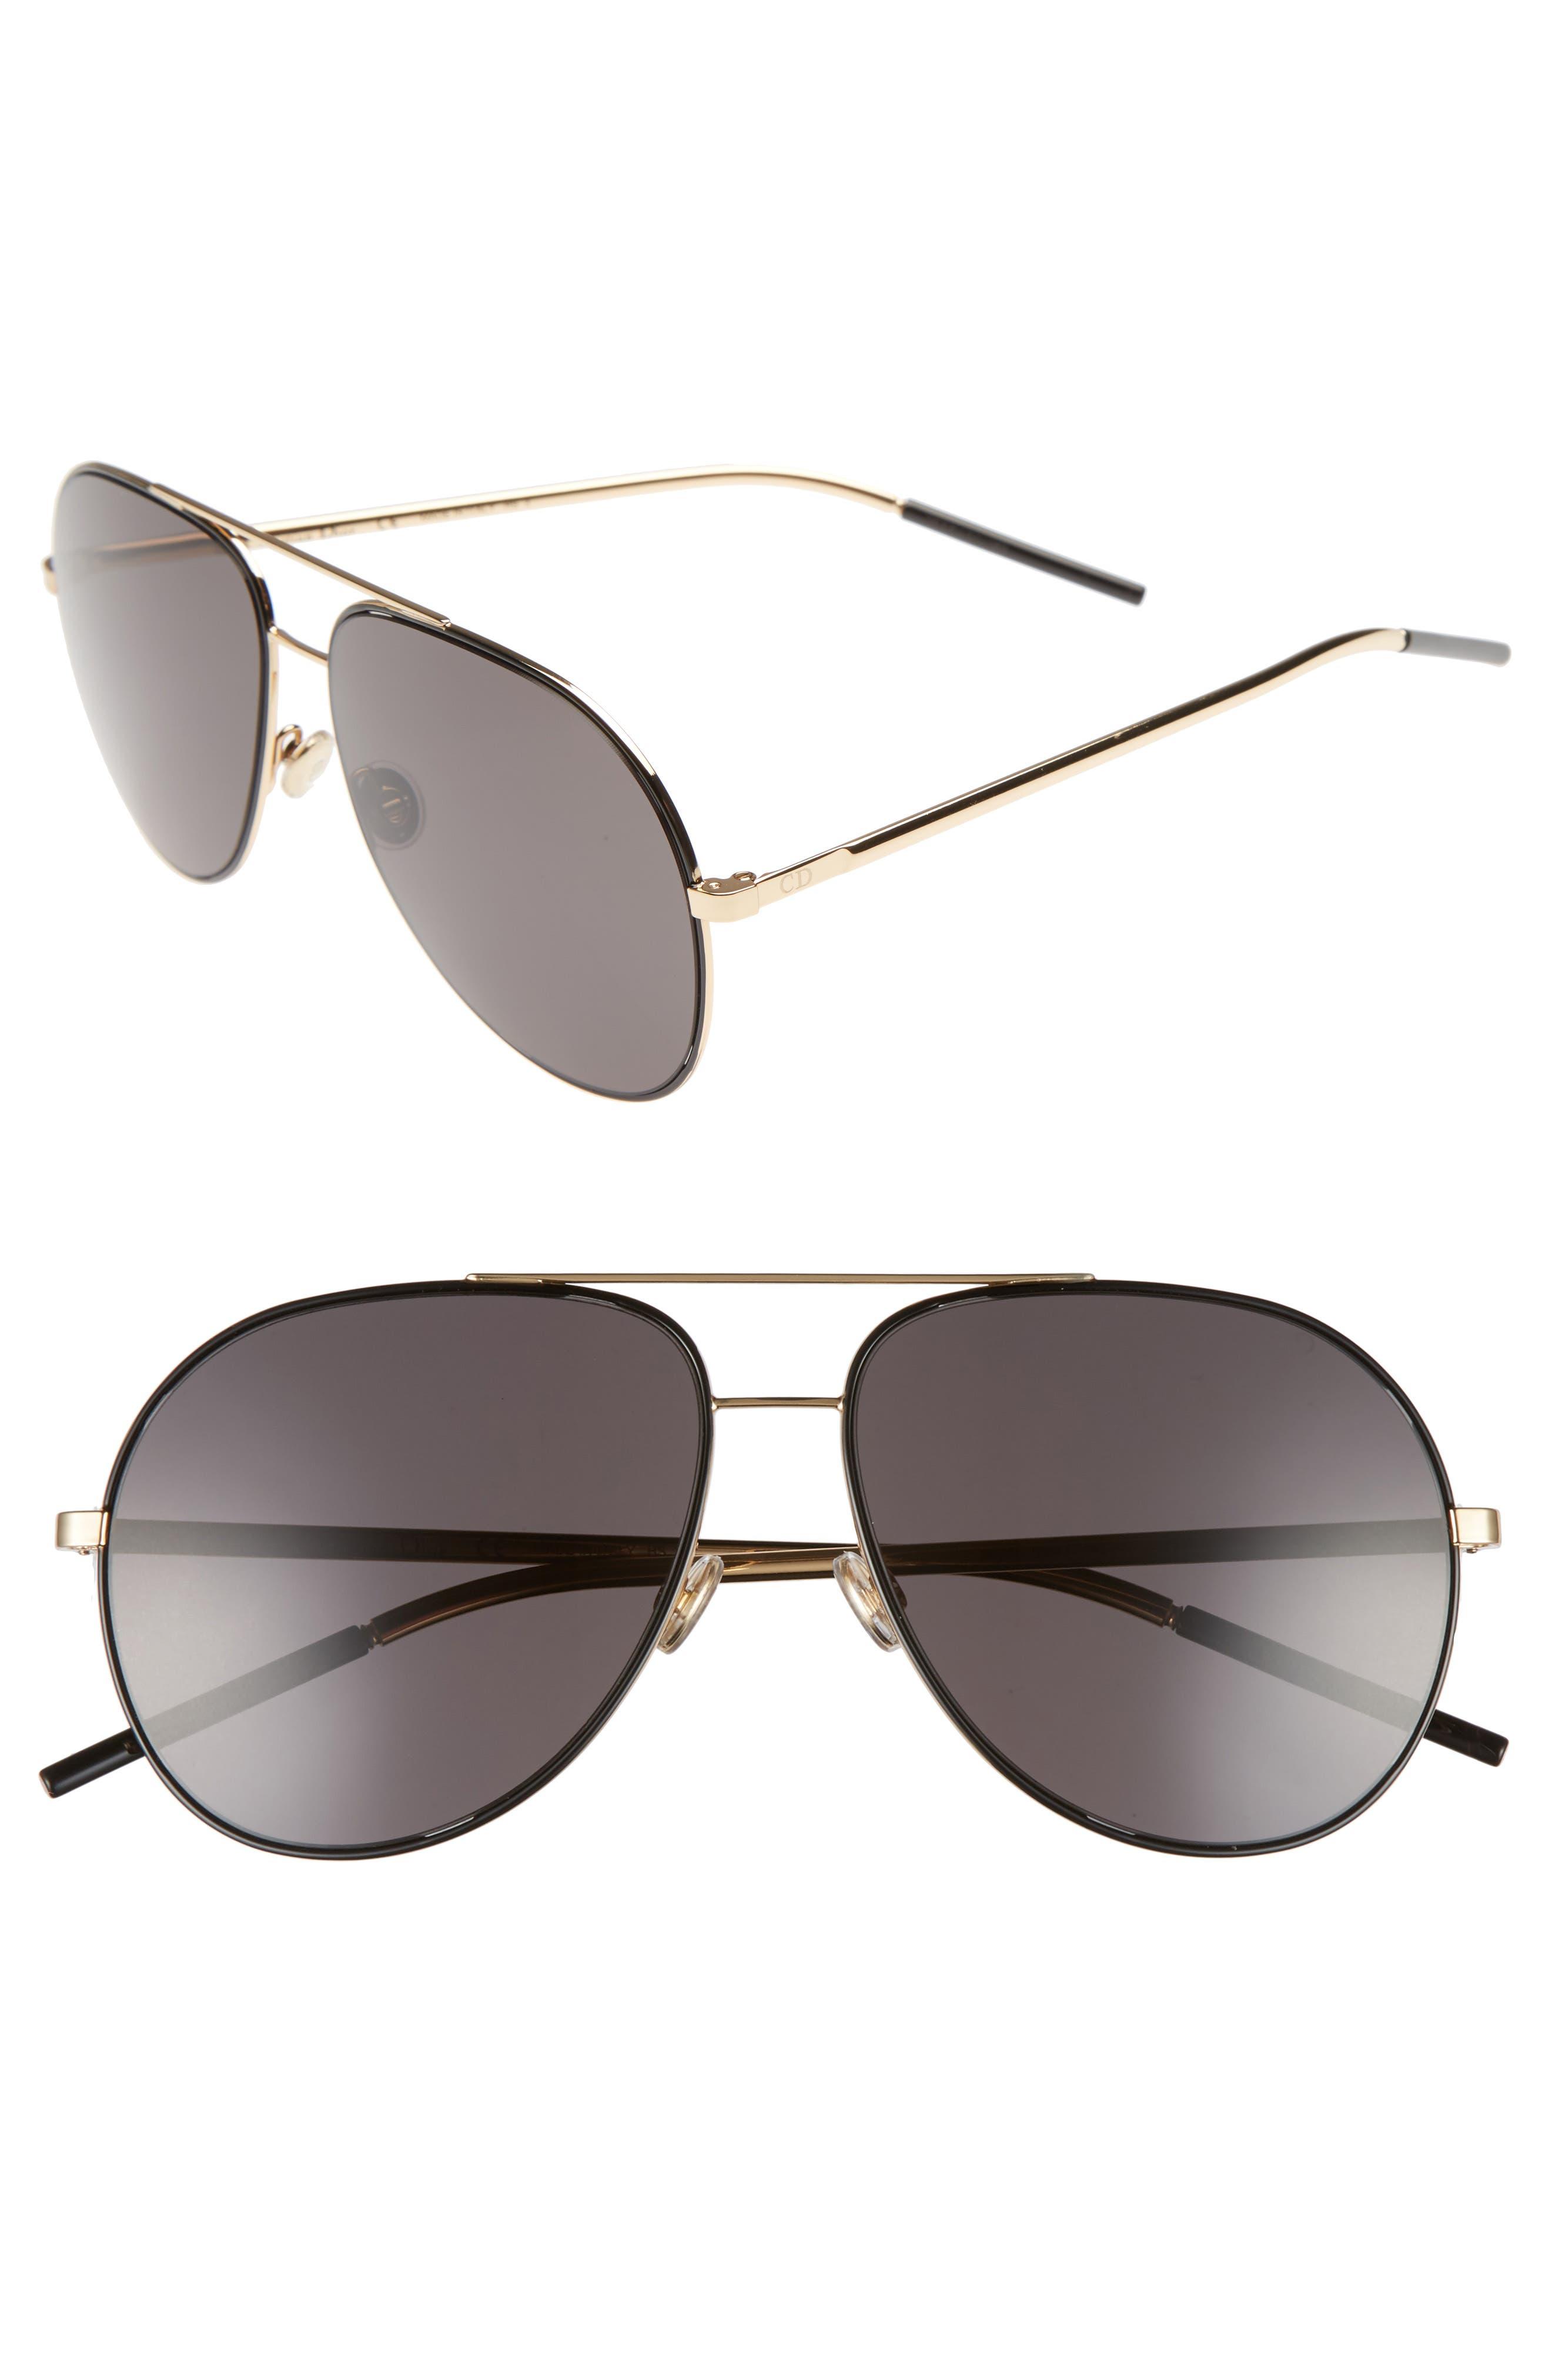 Alternate Image 1 Selected - Dior Astrals 59mm Aviator Sunglasses